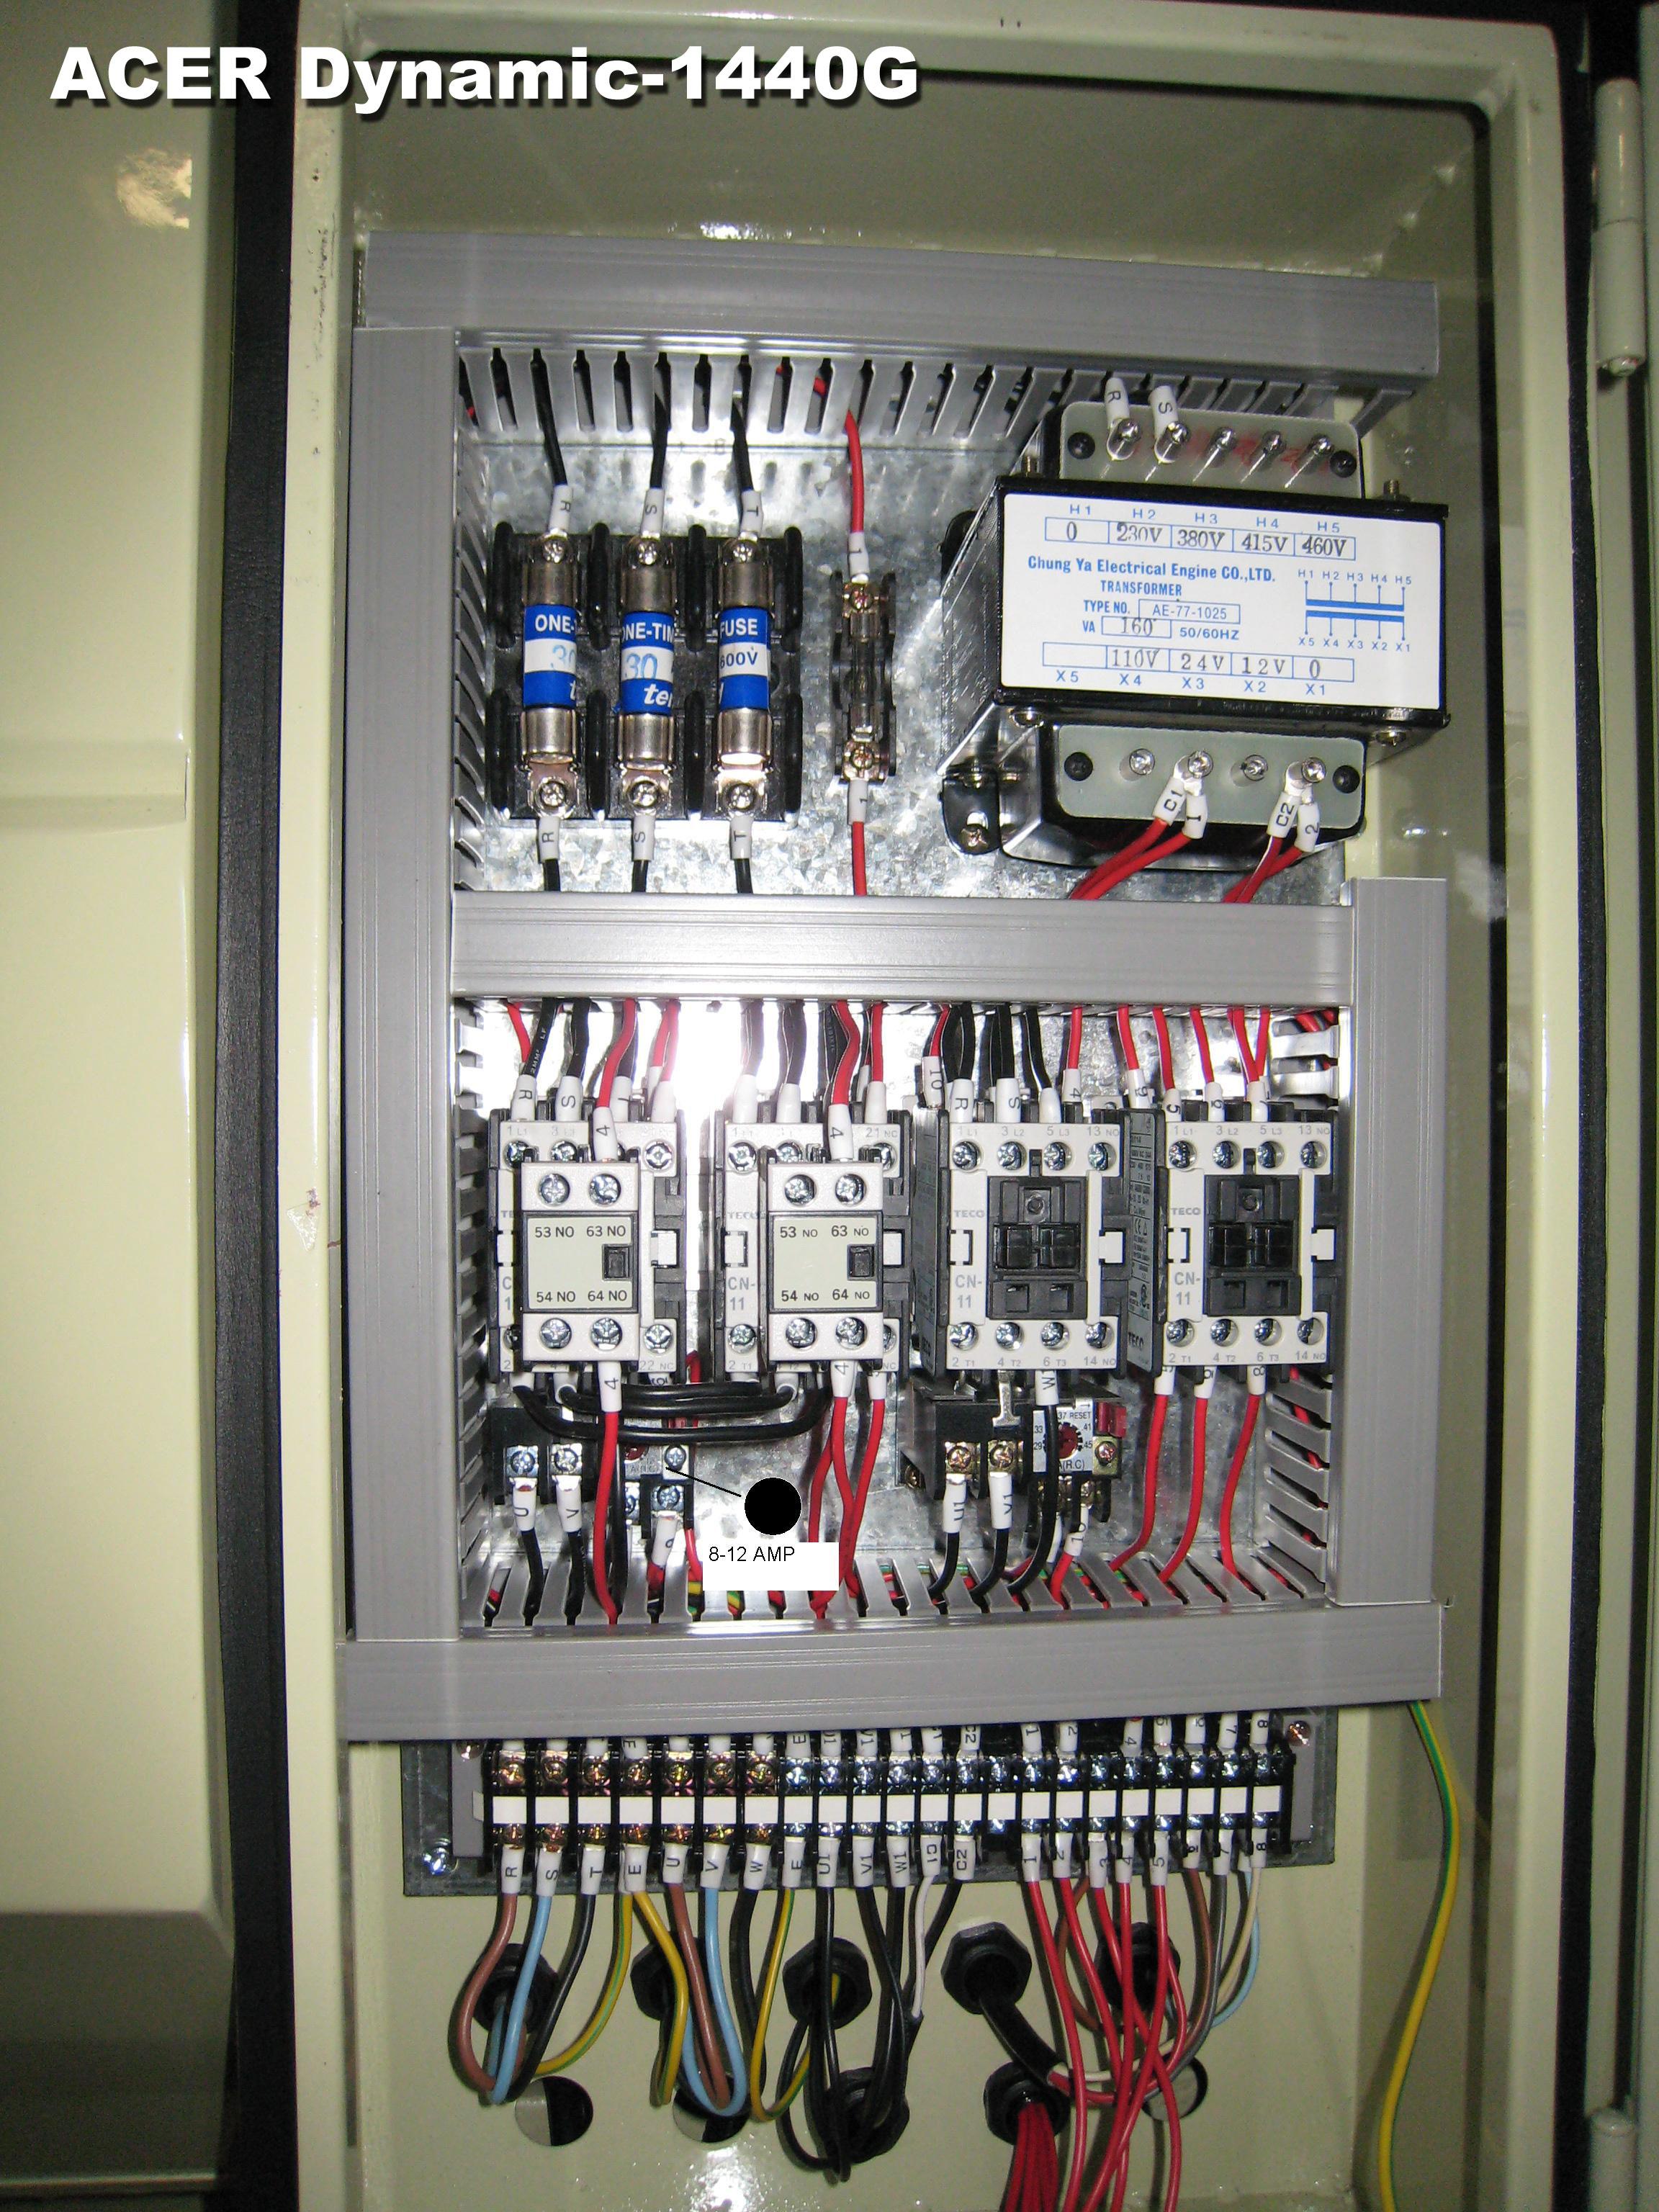 garage door remote control circuit diagram control circuit diagram acer group homepage downloads electrical layout amp control